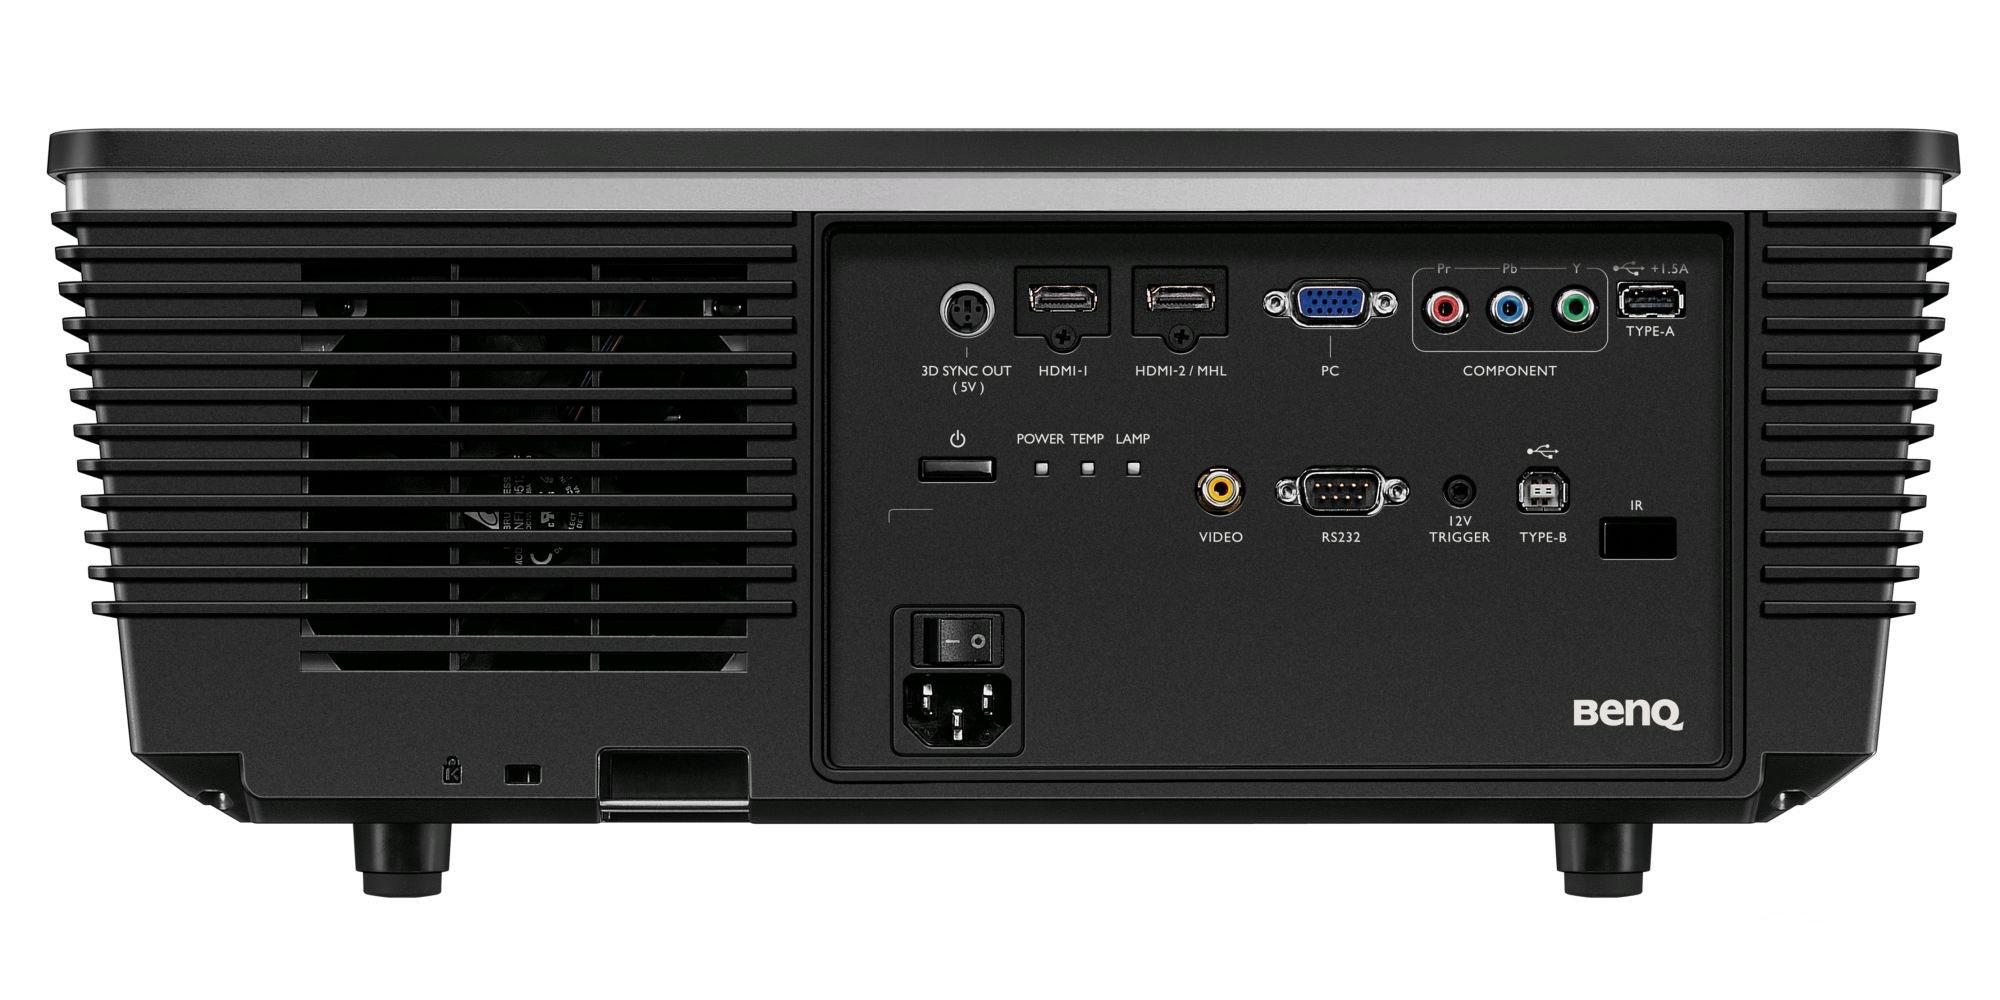 BenQ W8000 Projector Rear